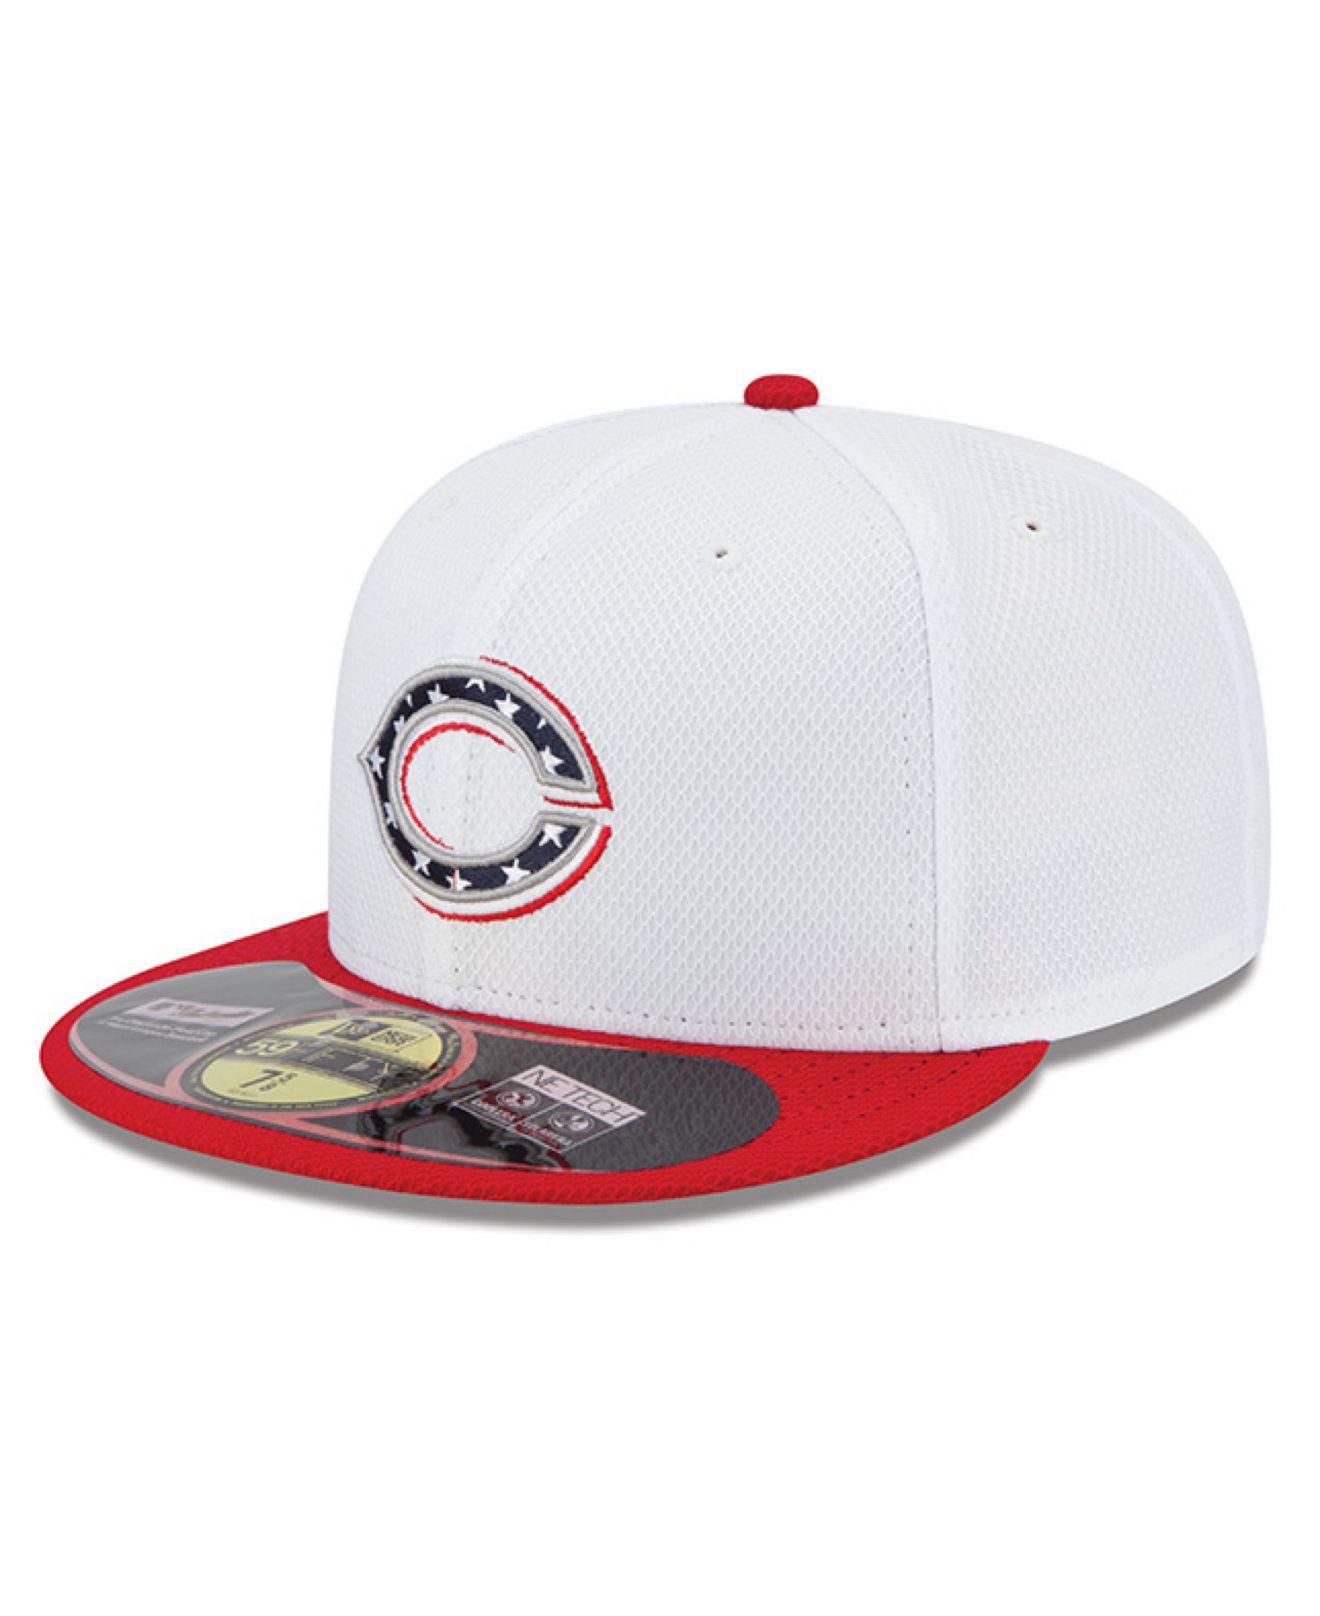 f2c7d6016d6a46 KTZ Cincinnati Reds Mlb 2013 July 4Th Stars & Stripes 59Fifty Cap in White  for Men - Lyst